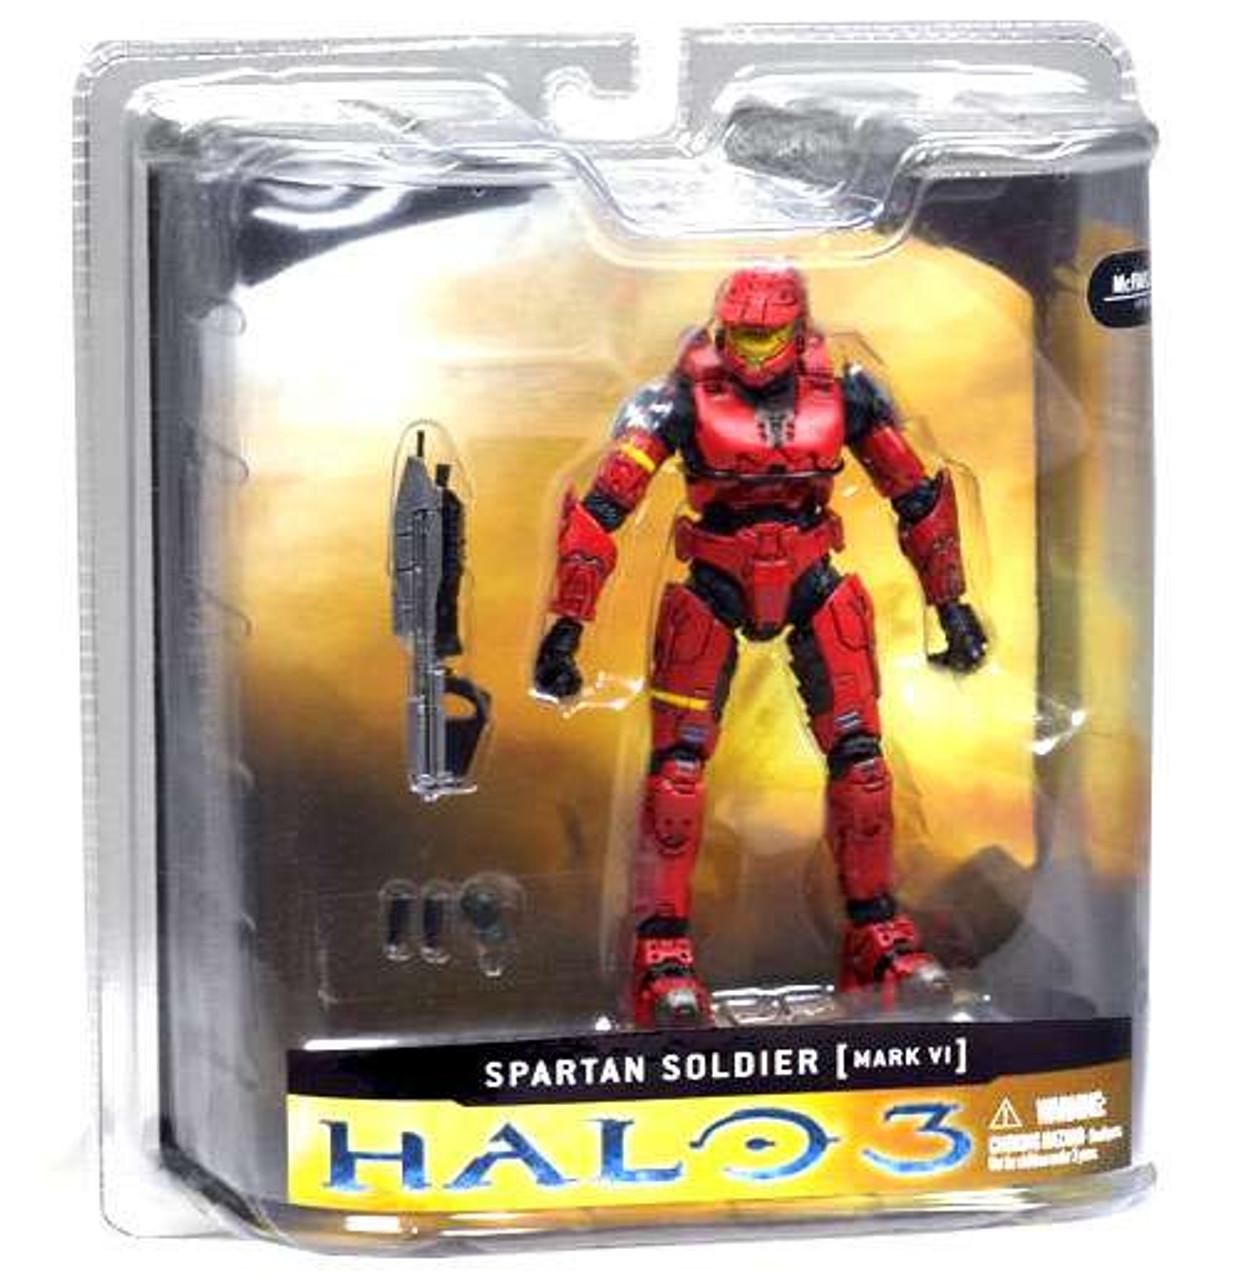 Halo McFarlane Action Figure Series 2 Olive Spartan Soldier EOD